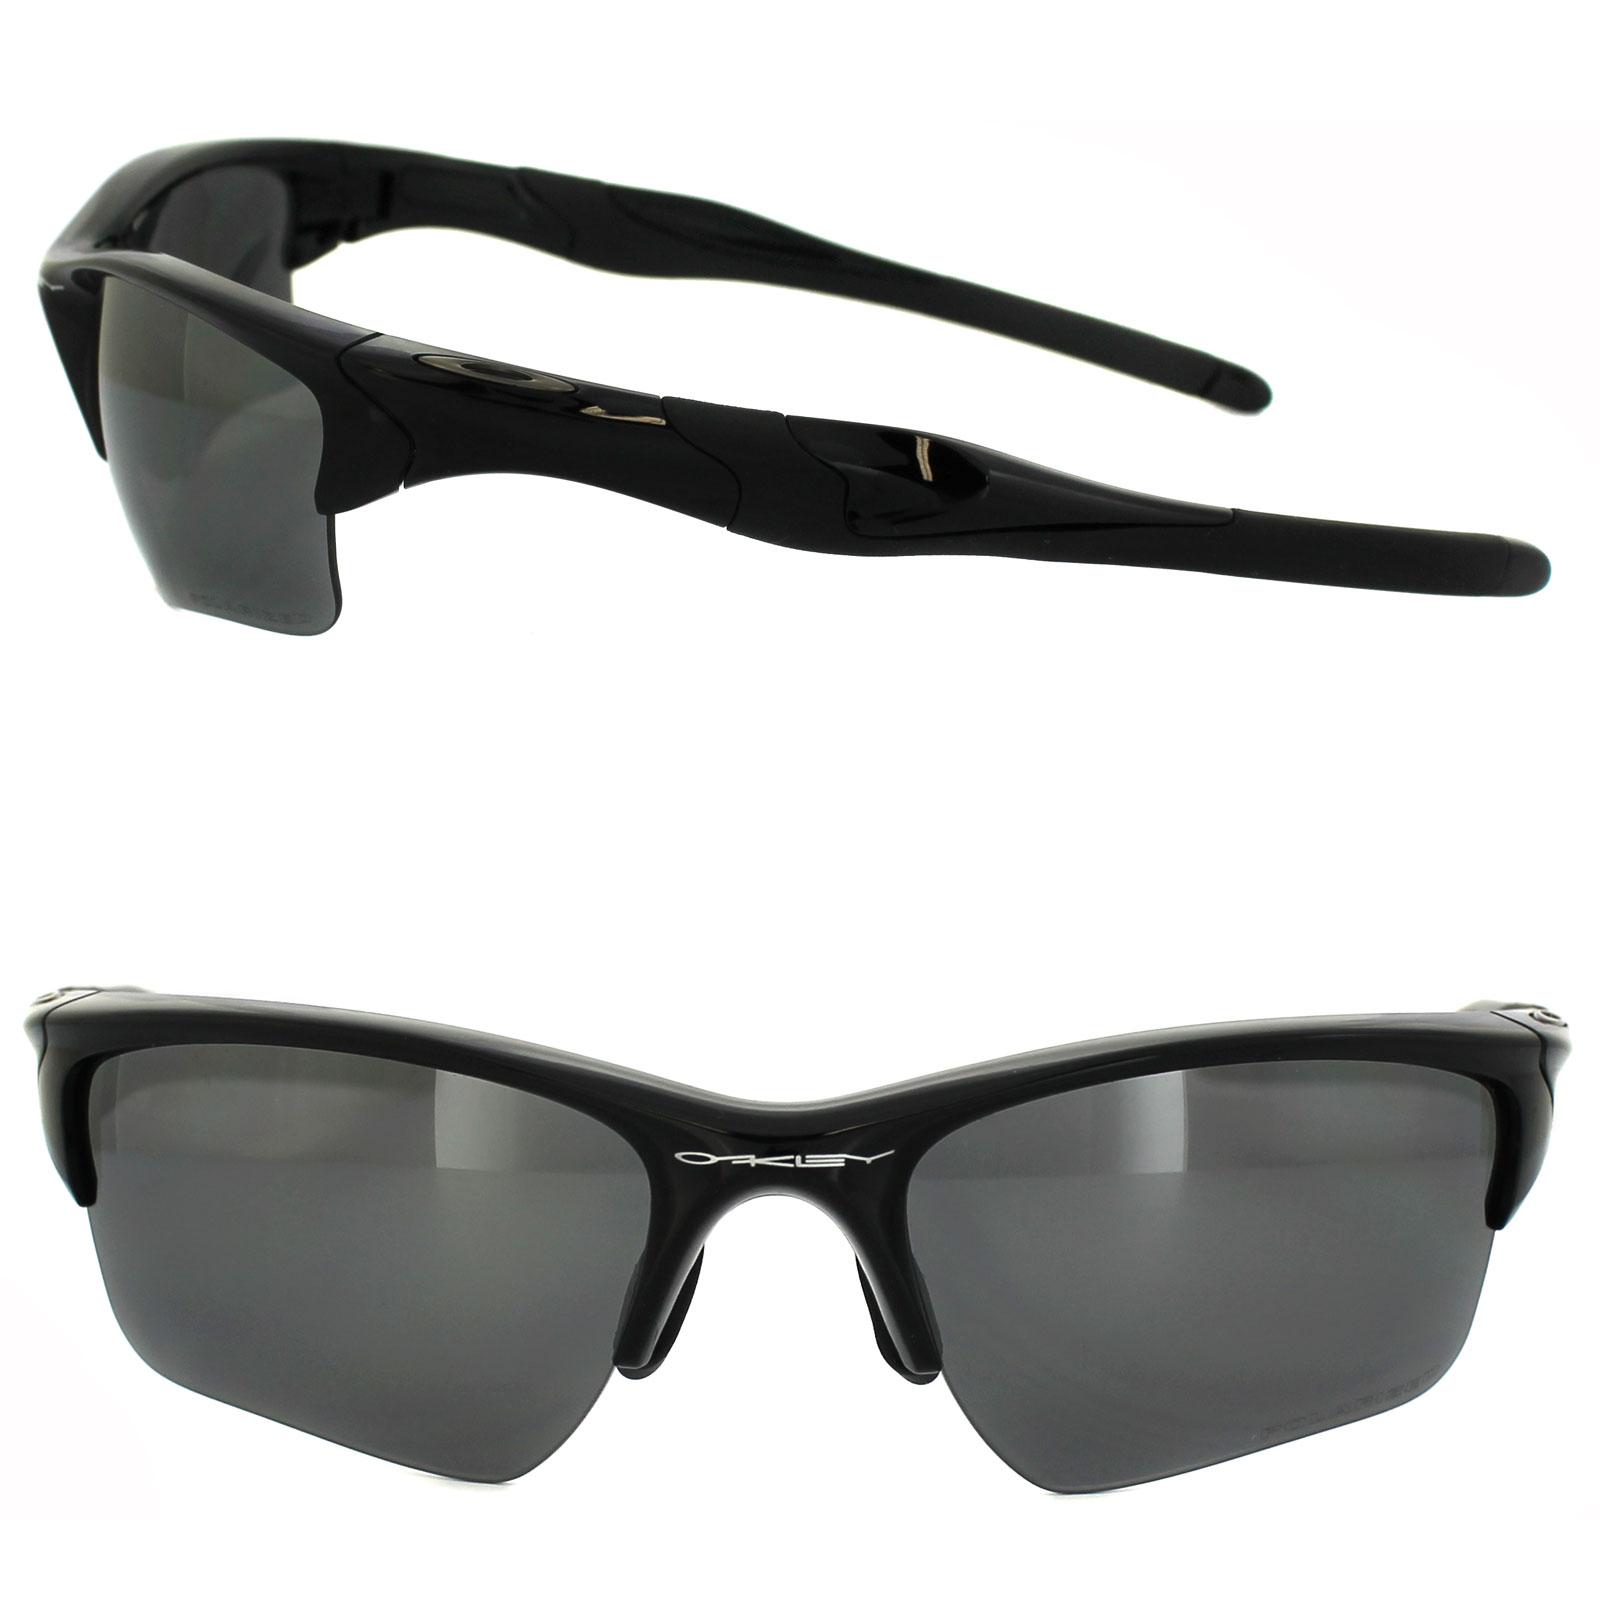 9ff1807e9e Sentinel Oakley Sunglasses Half Jacket 2.0 XL Polished Black Iridium  Polarized OO9154-05